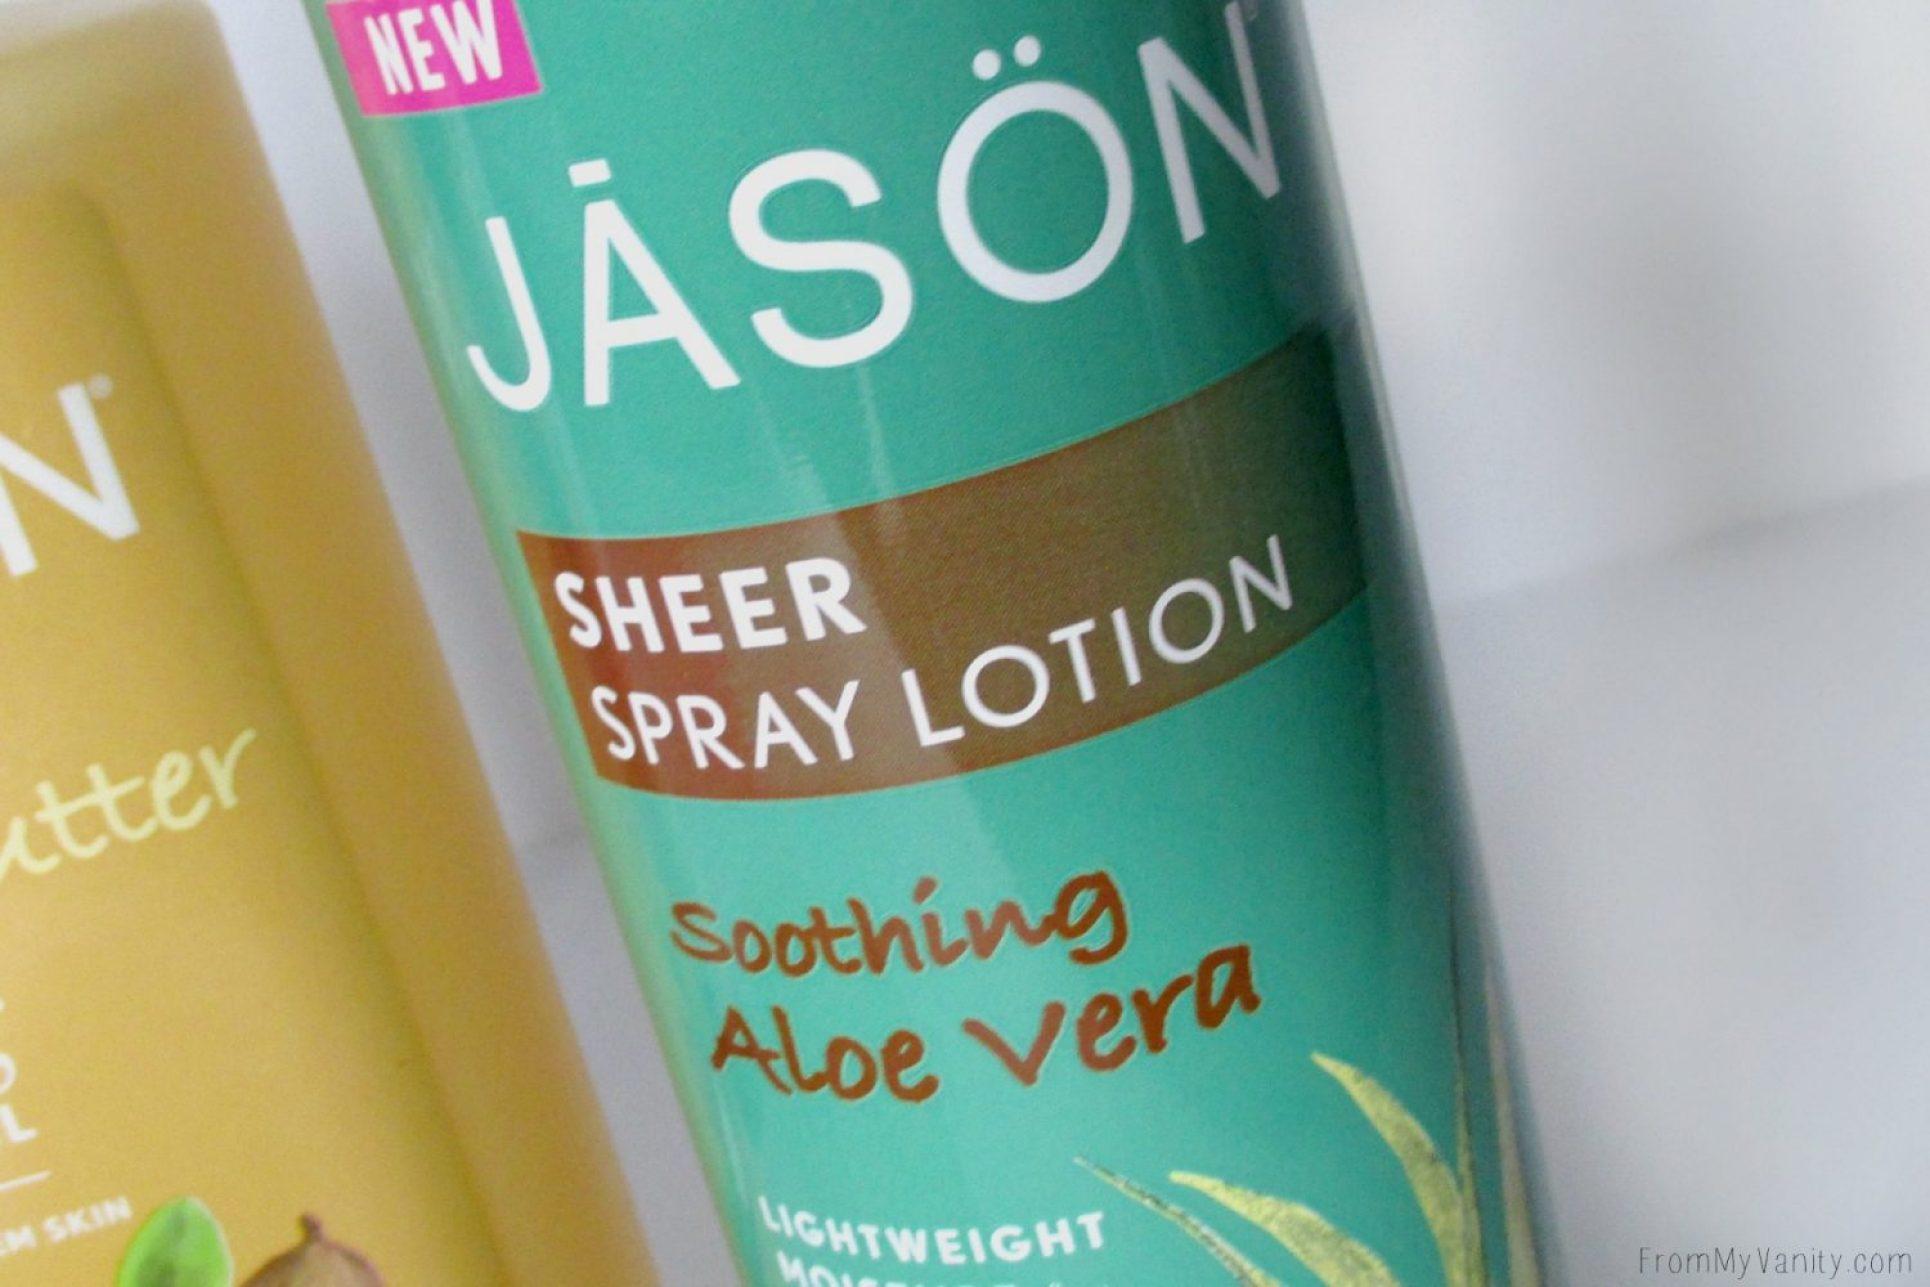 New Products from Avalon Organics, Jason, Alba Botanica, & Proactiv+ // Jason Sheer Spray Lotion // @LadyKaty92 FromMyVanity.com